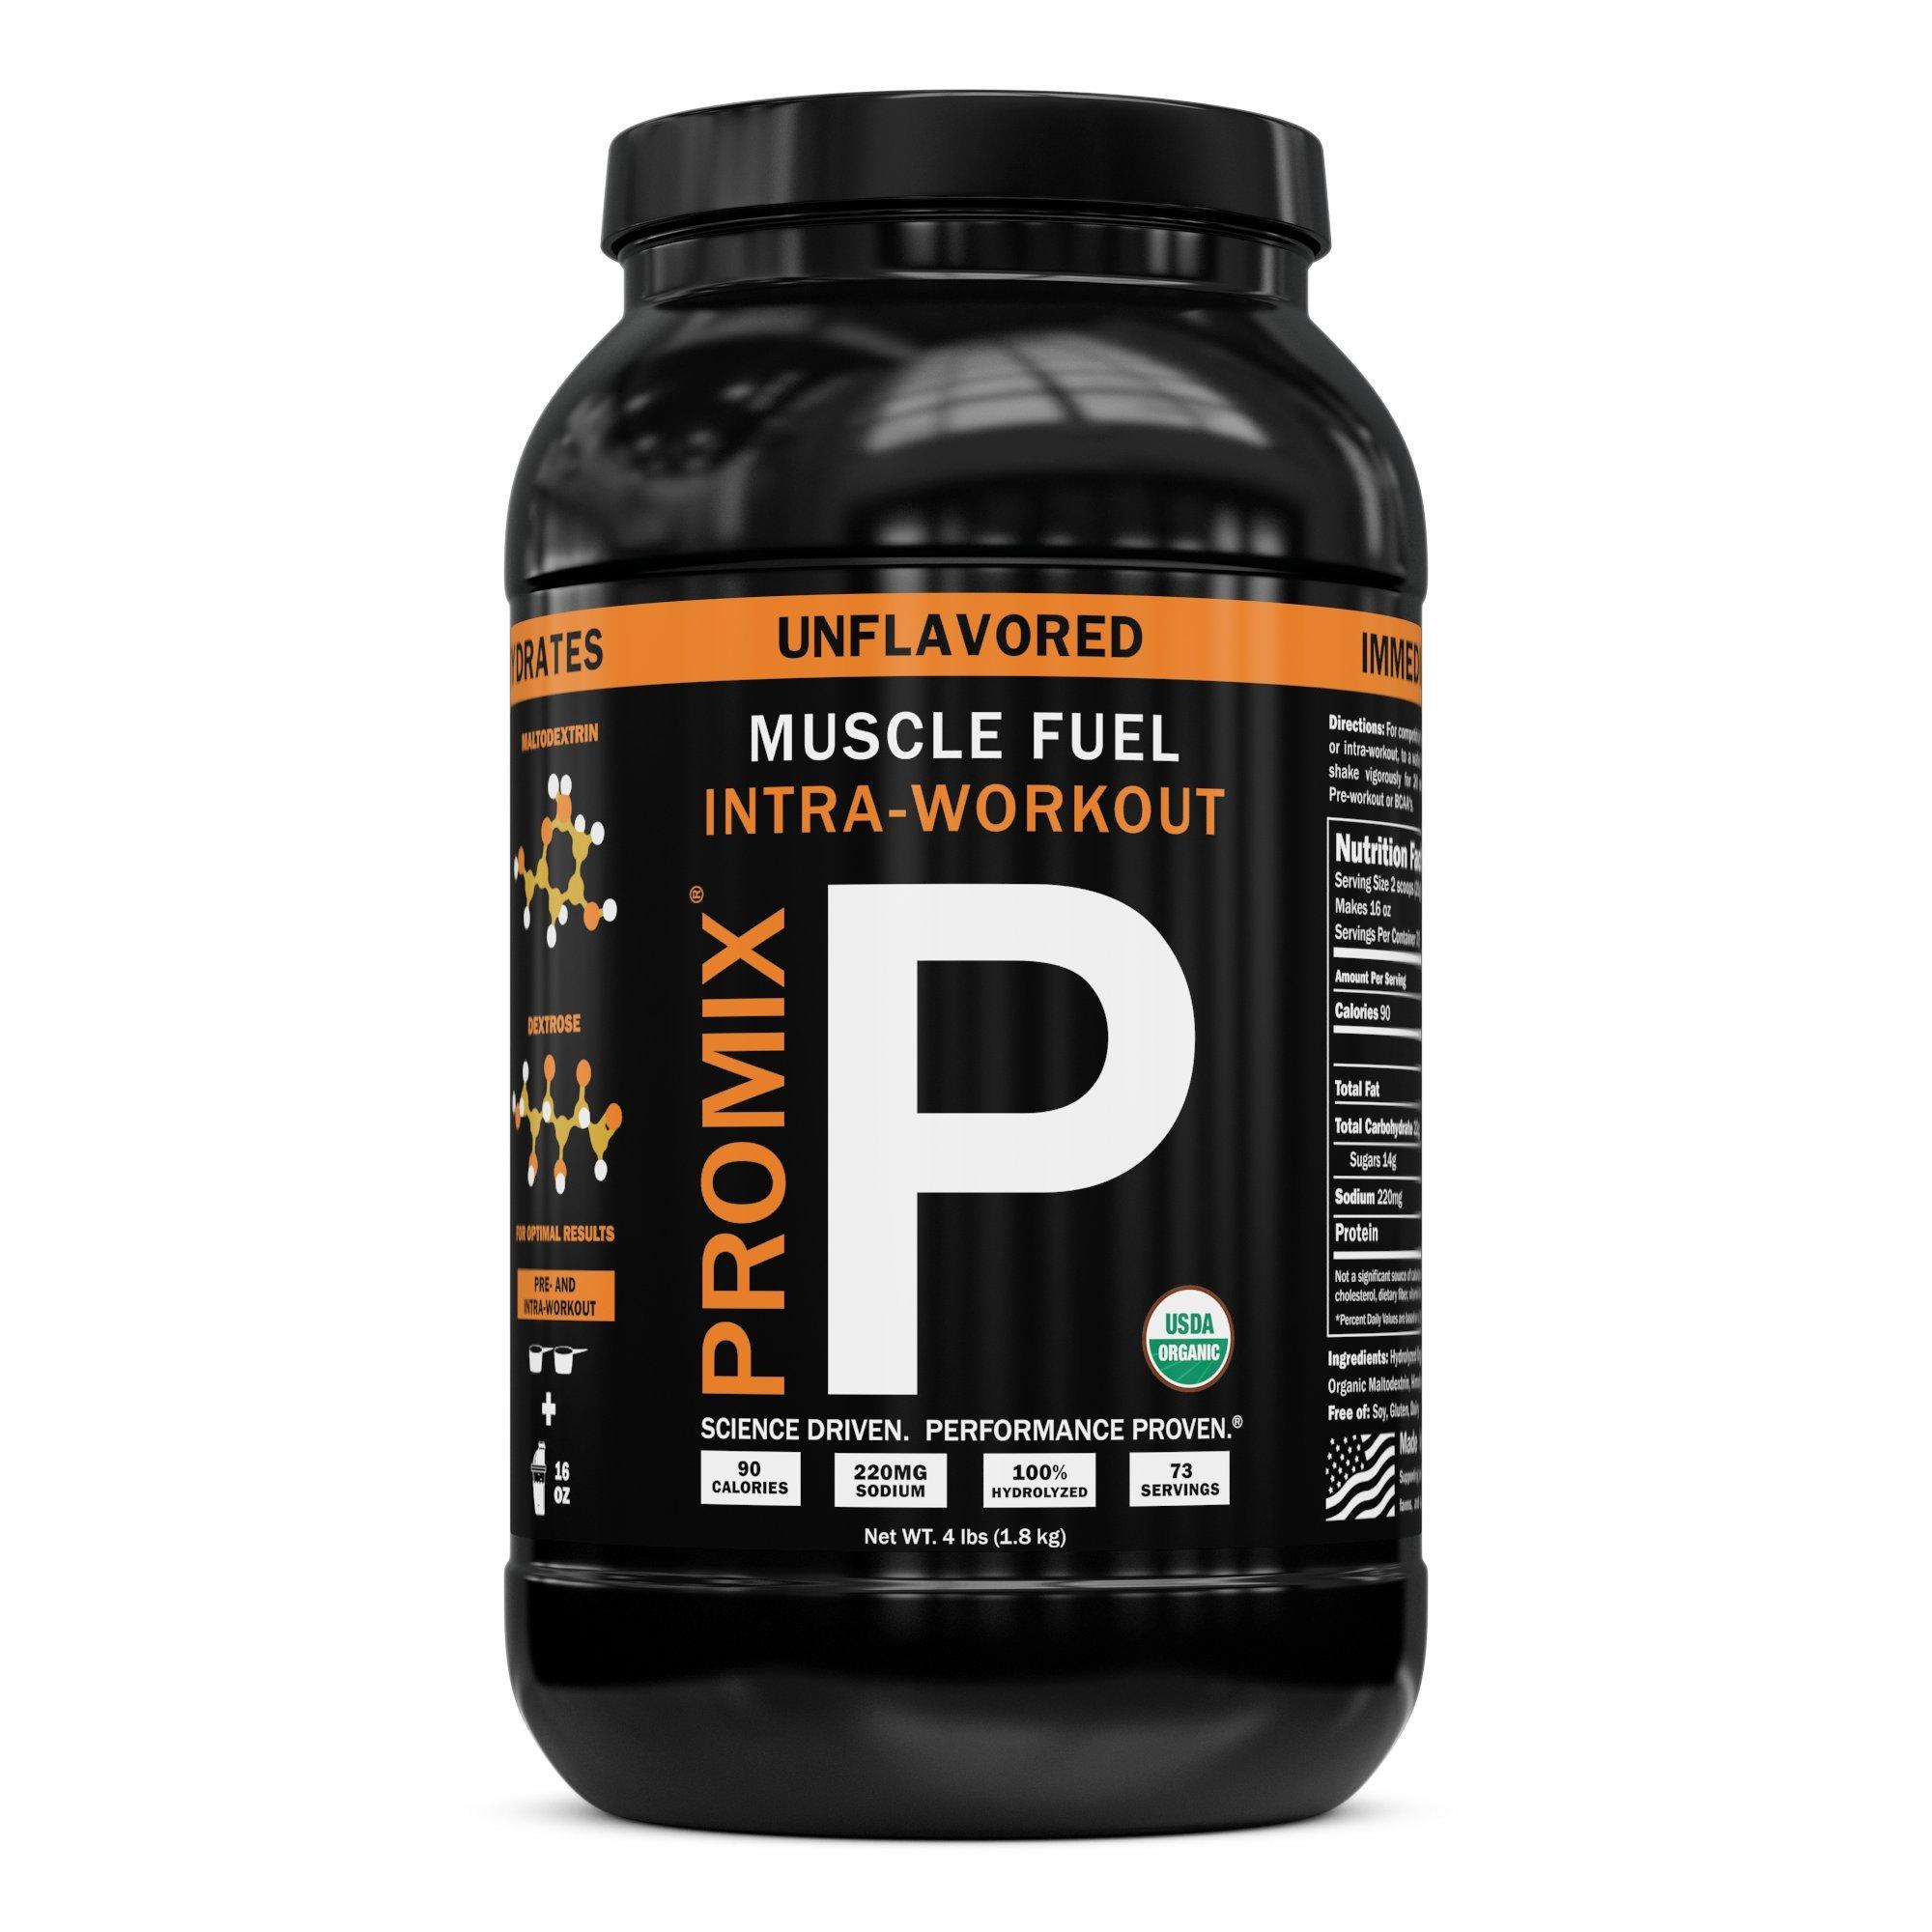 100% Lean Muscle Fuel/Proven Intra-Workout Glycogen Pump Igniter/More Reps+Power/Lean Muscle / 4 LB Bulk-73 SVG, Lemon-Lime/Paleo/Gluten-Free/Non-GMO/Vegan/3rd Party Testing GMP